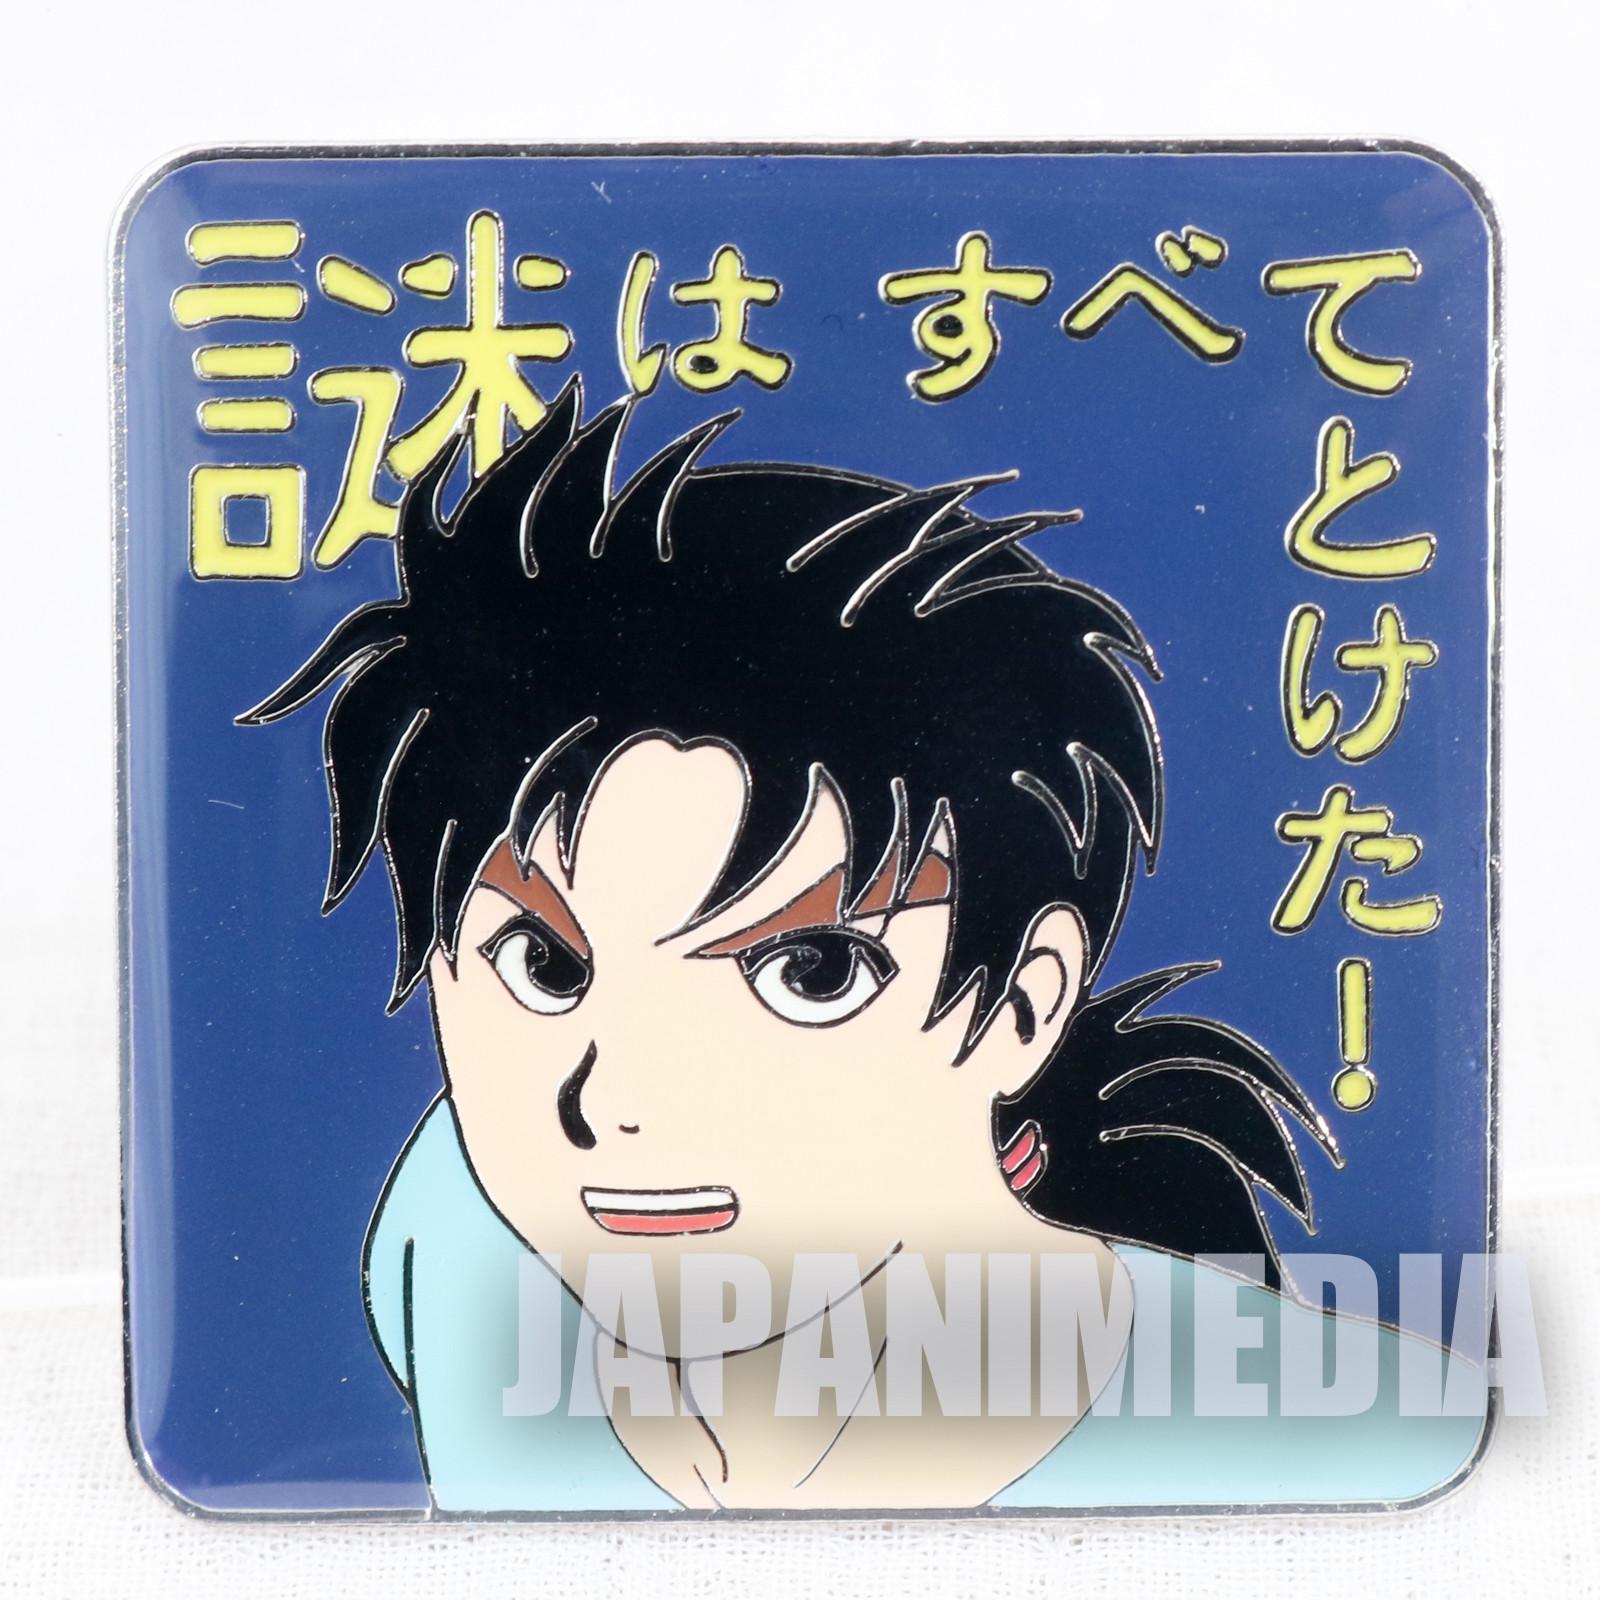 Retro The Kindaichi Case Files Metal Pins Shonen Magazine JAPAN ANIME